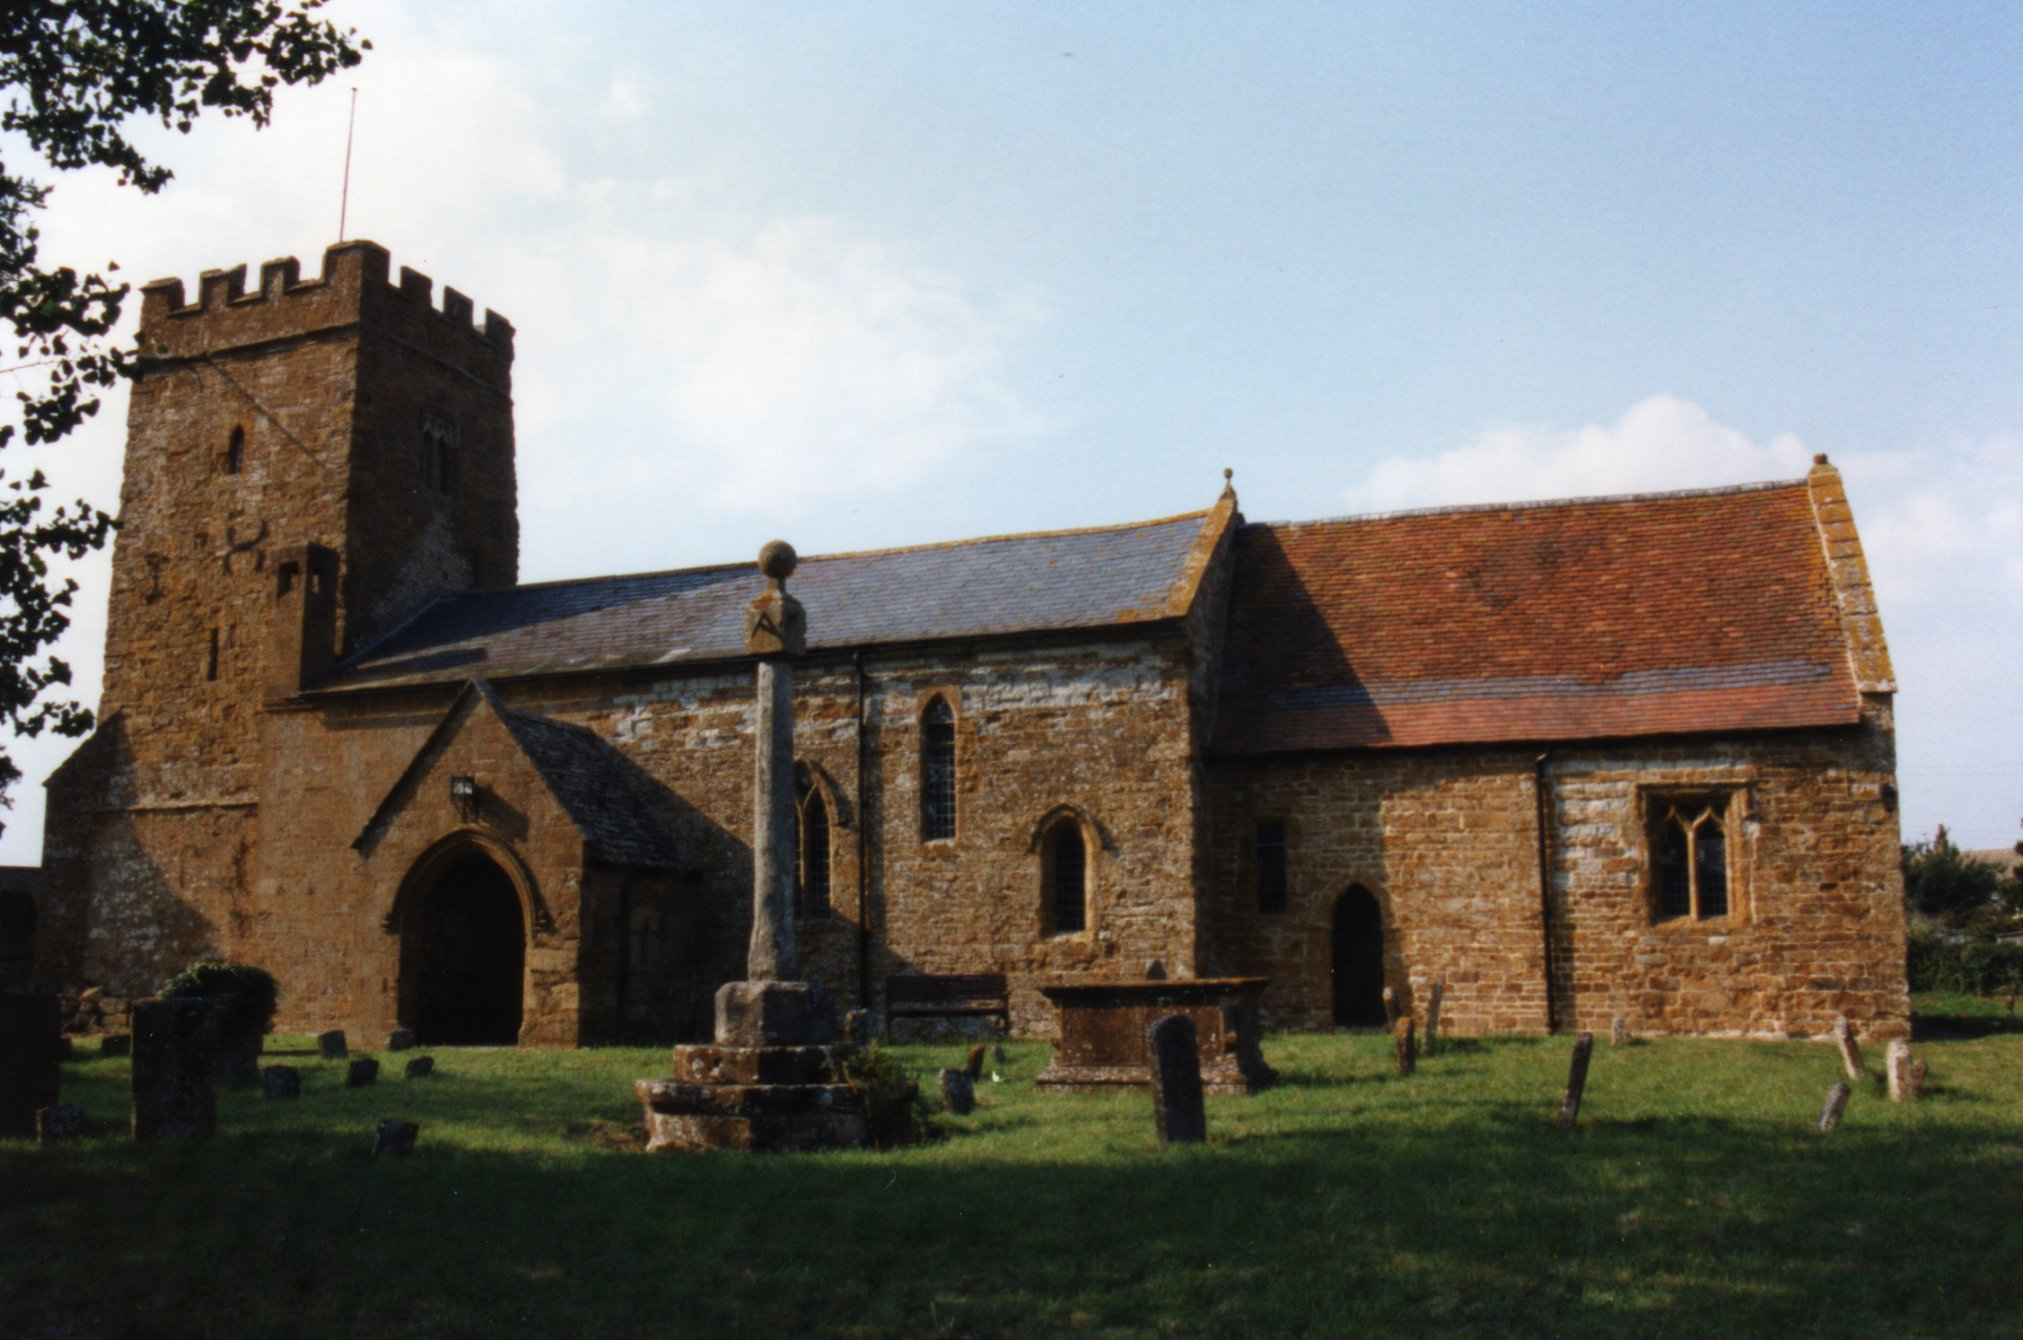 St. Peter's, Whatcote